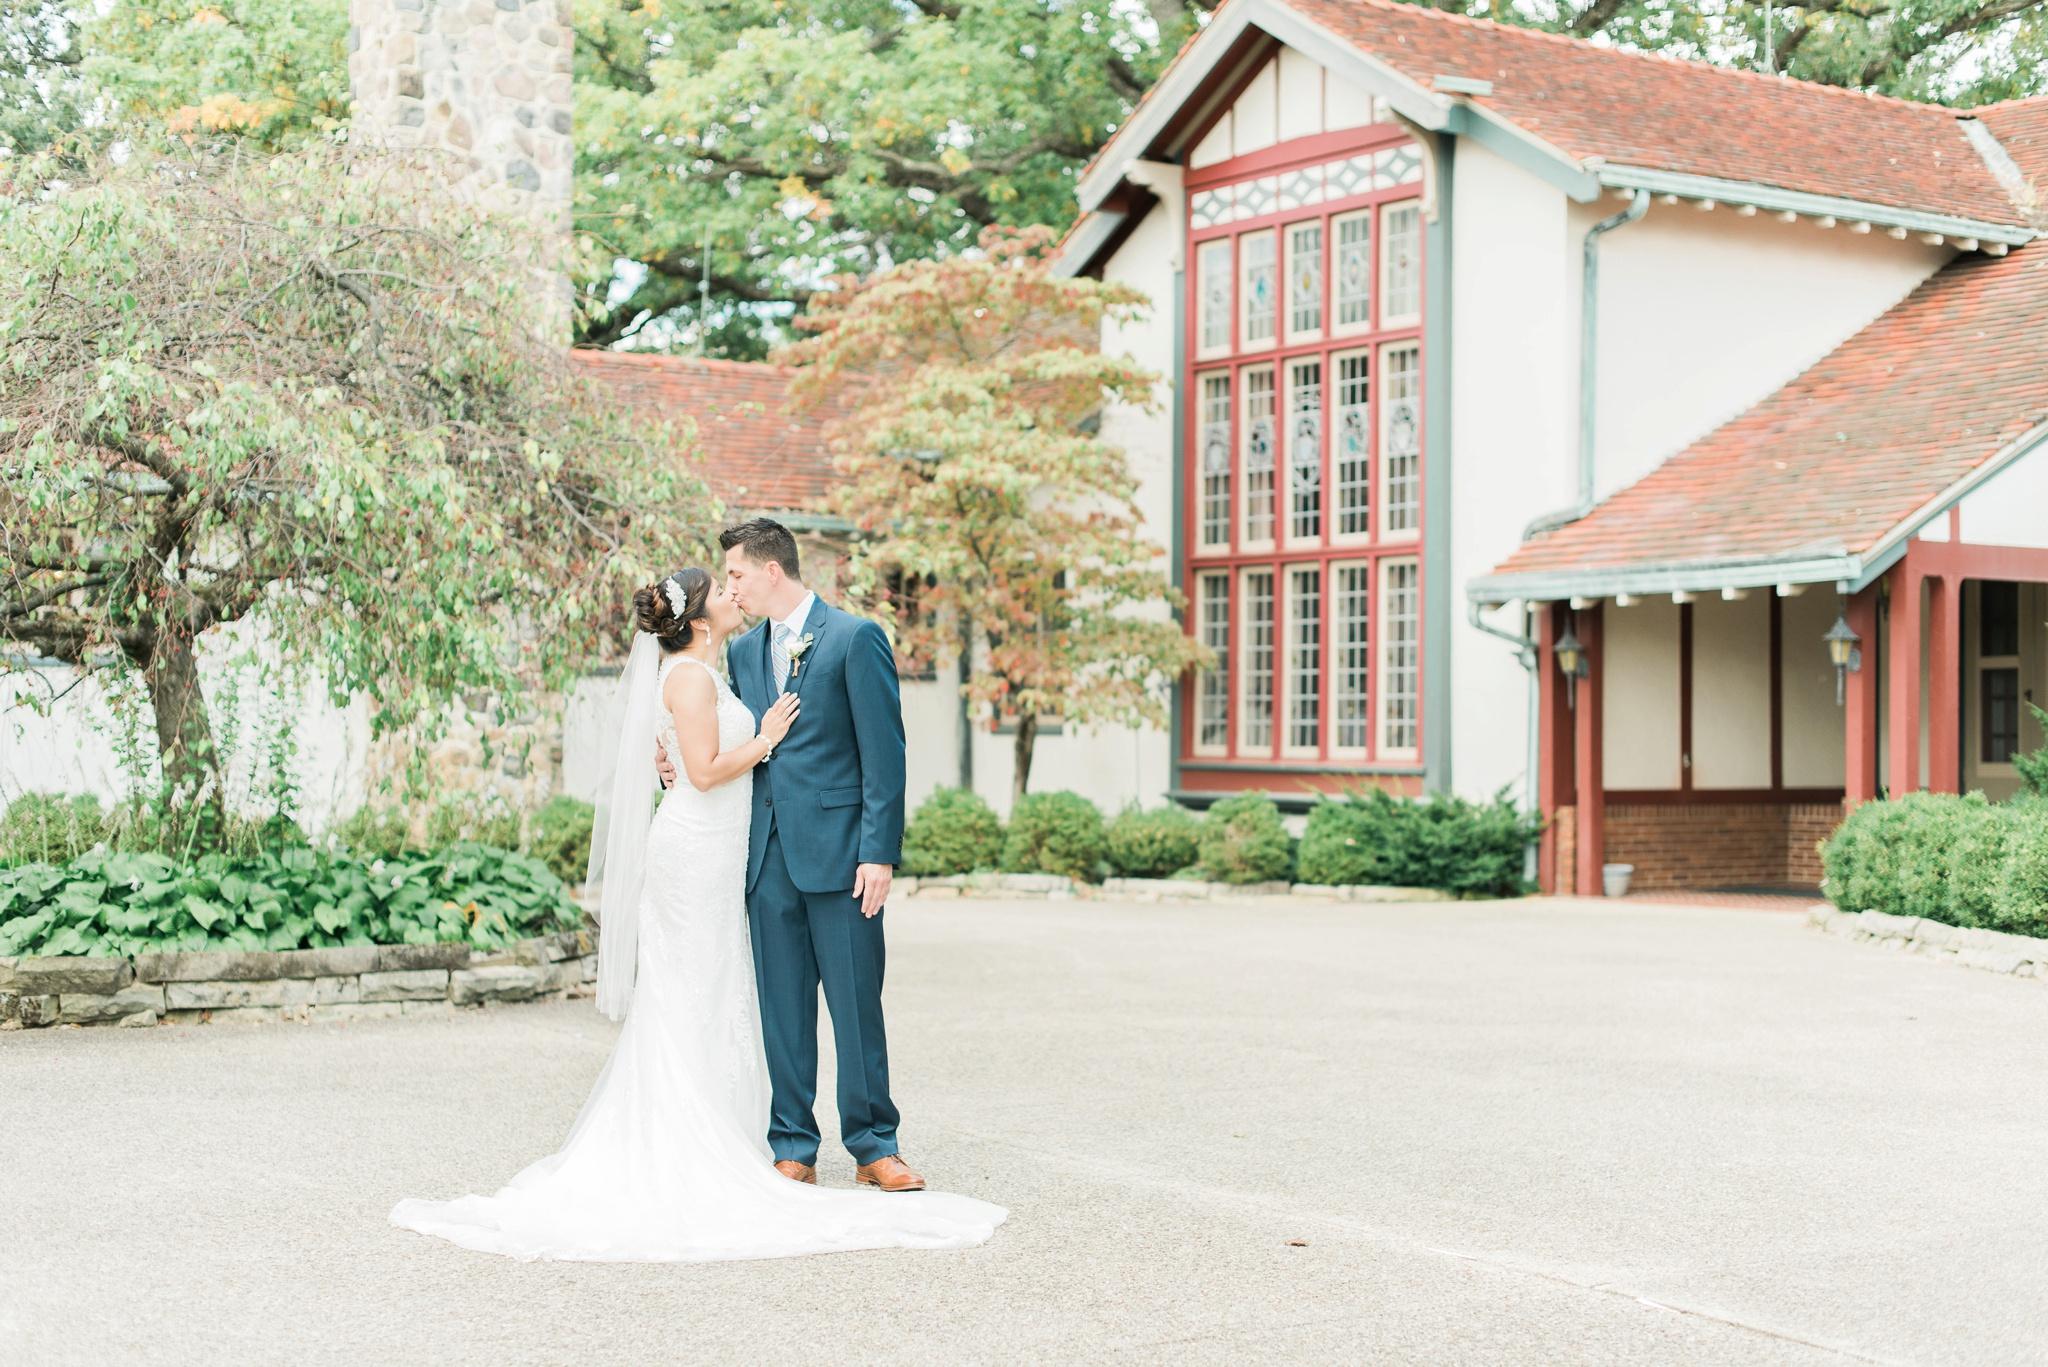 beverly-mansion-wedding-marengo-ohio-photographer_0046.jpg